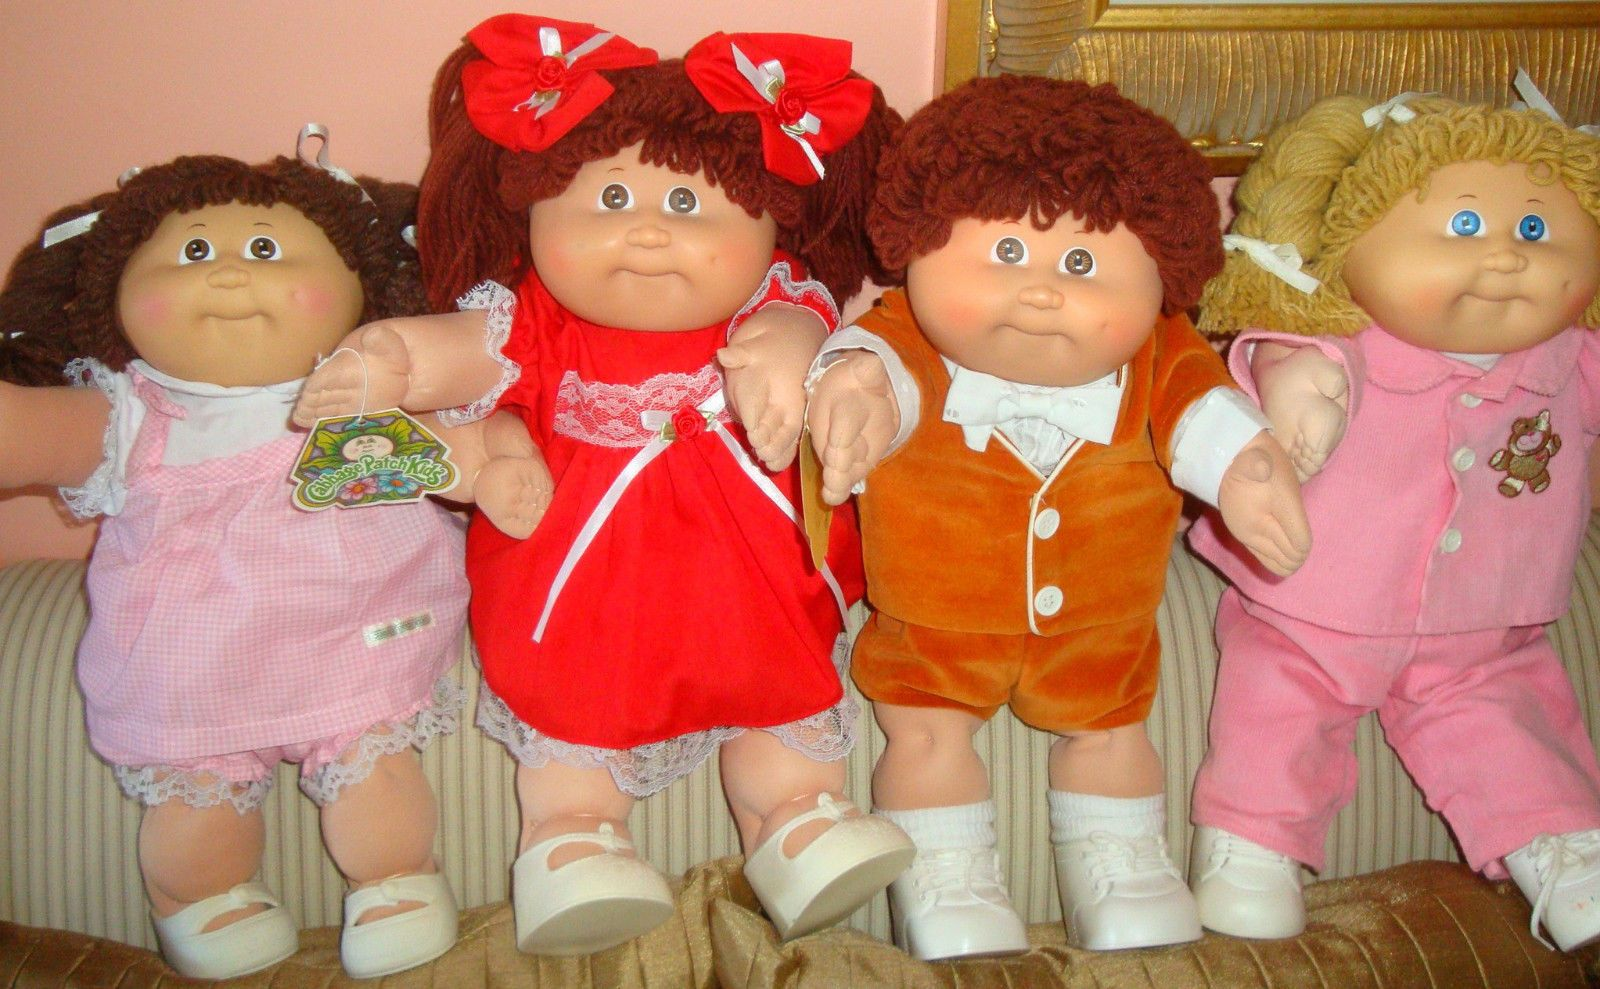 17 Vintage Cabbage Patch Kids Doll Lot Cpk Jesmar Coleco Bald Boy Girl 1 2 3 Cabbage Patch Kids Cabbage Patch Kids Dolls Patch Kids